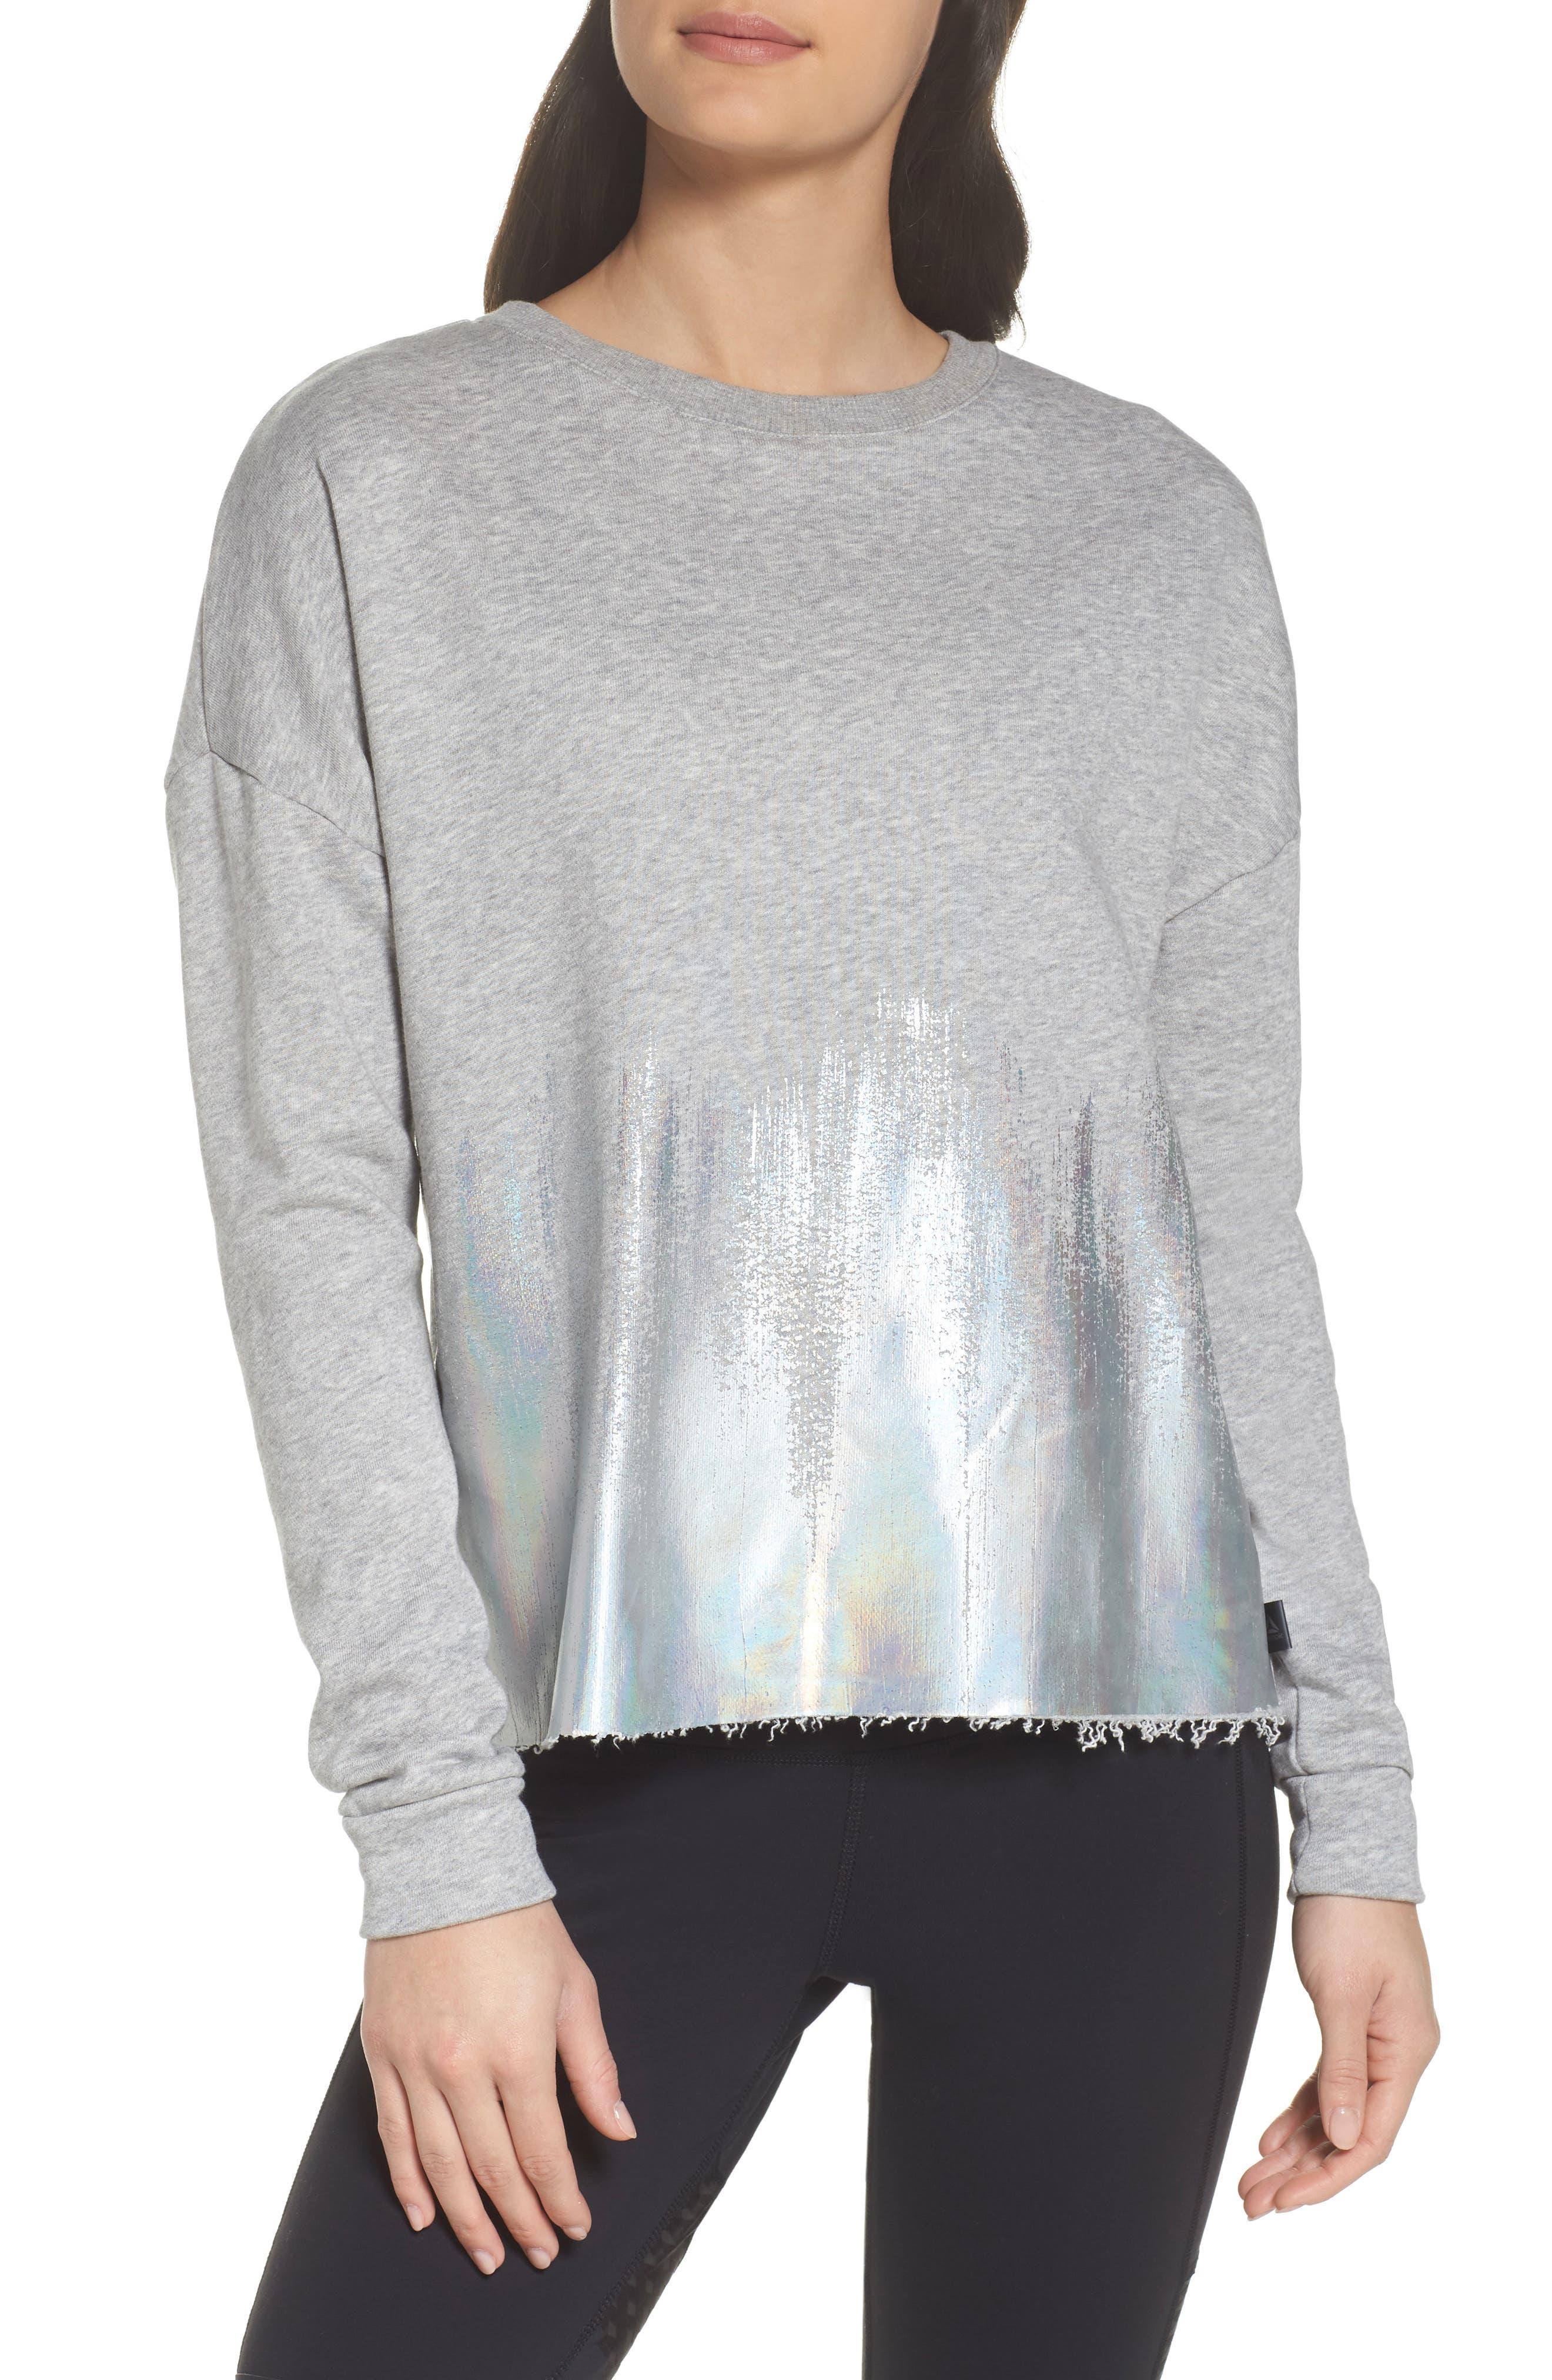 Reebok Foil Crewneck Shirt